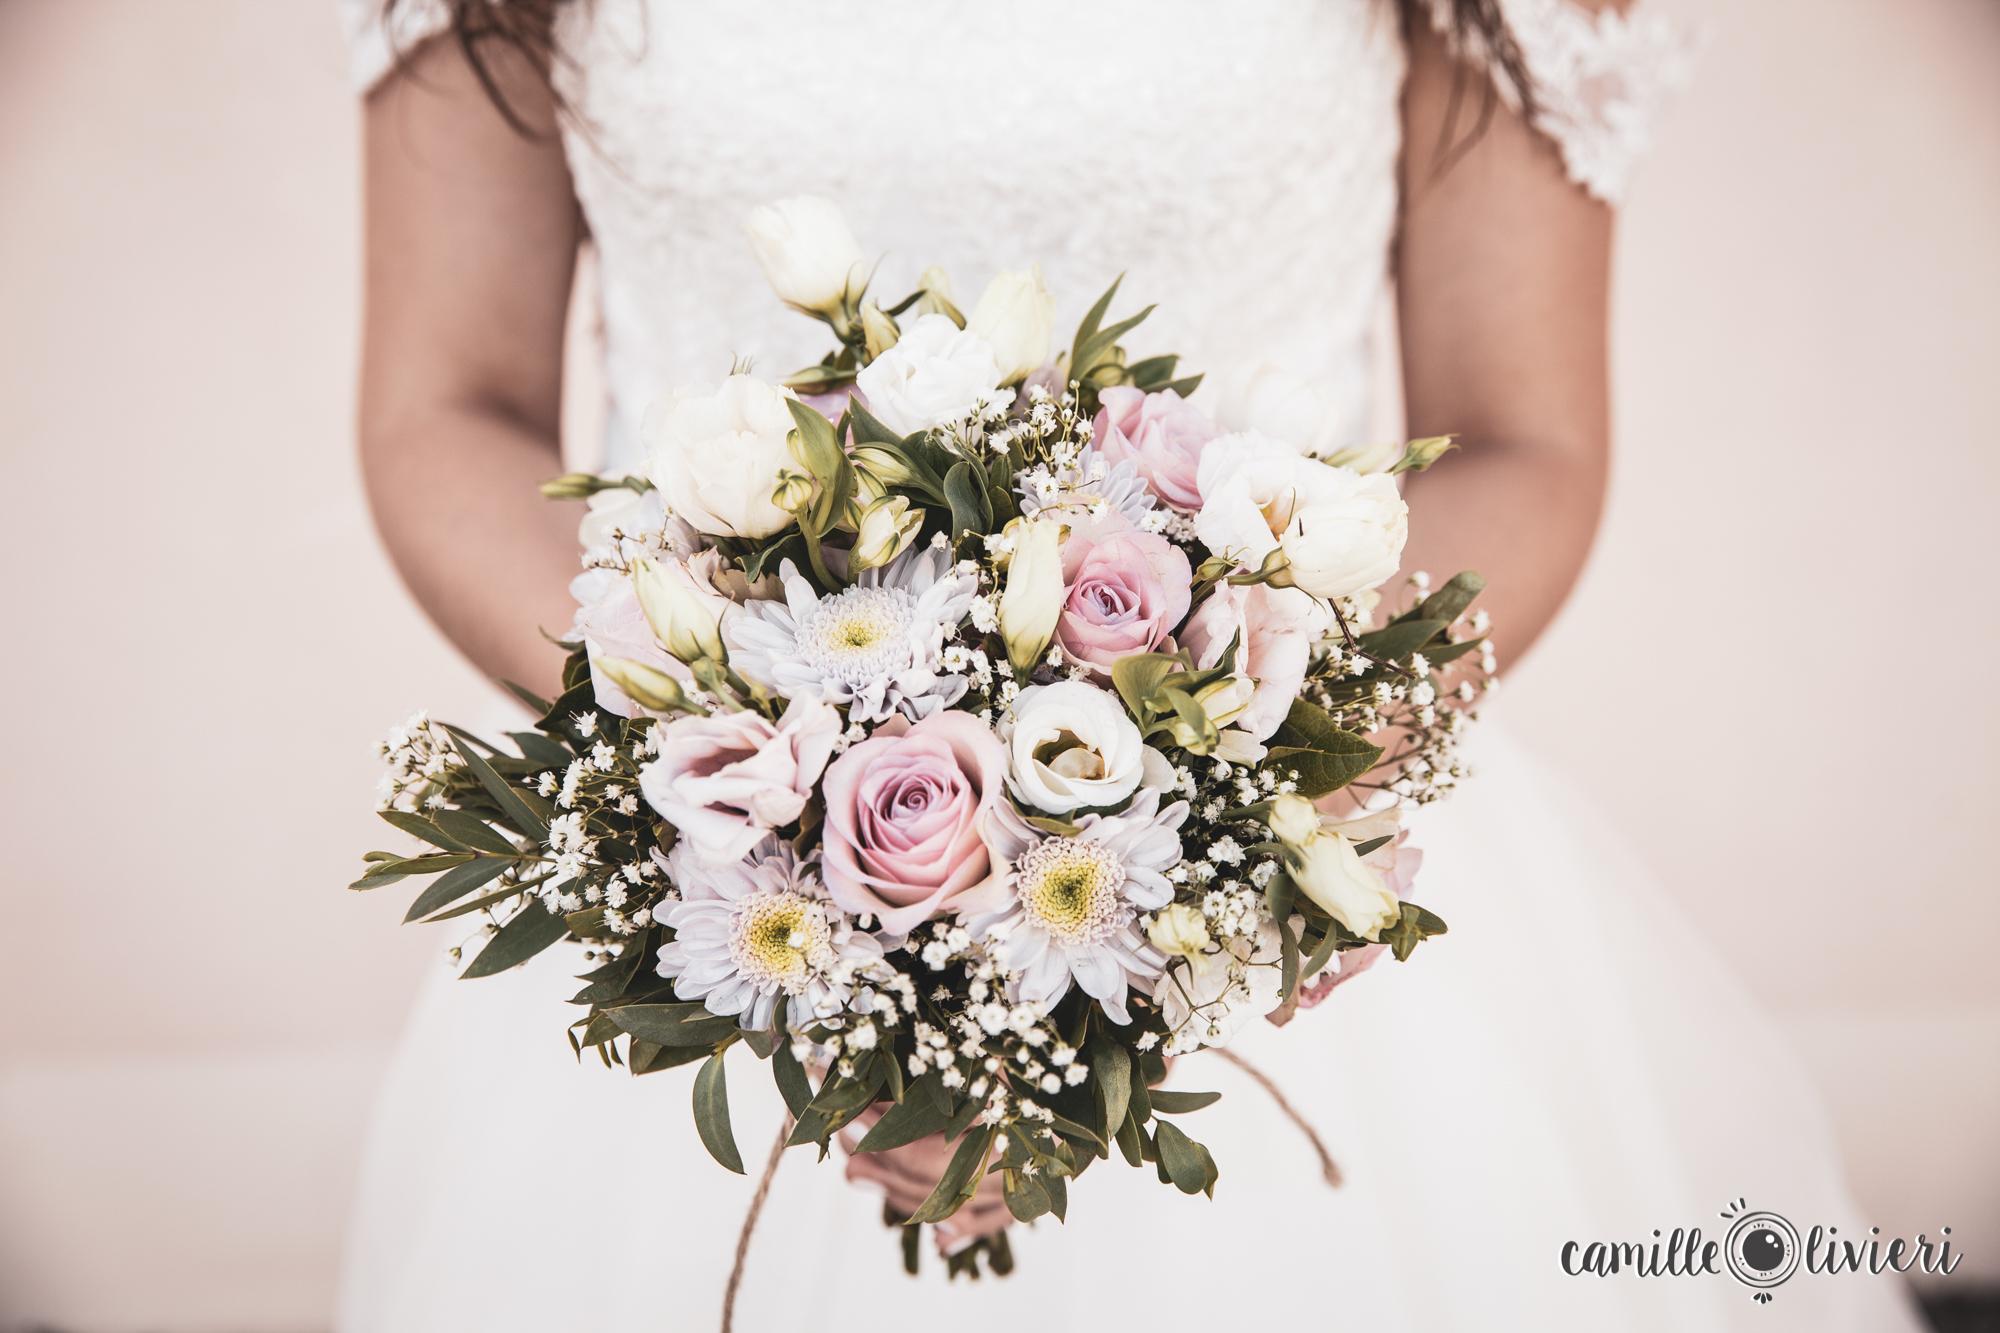 photographe_grenoble_mariage-camille-olivieri-76